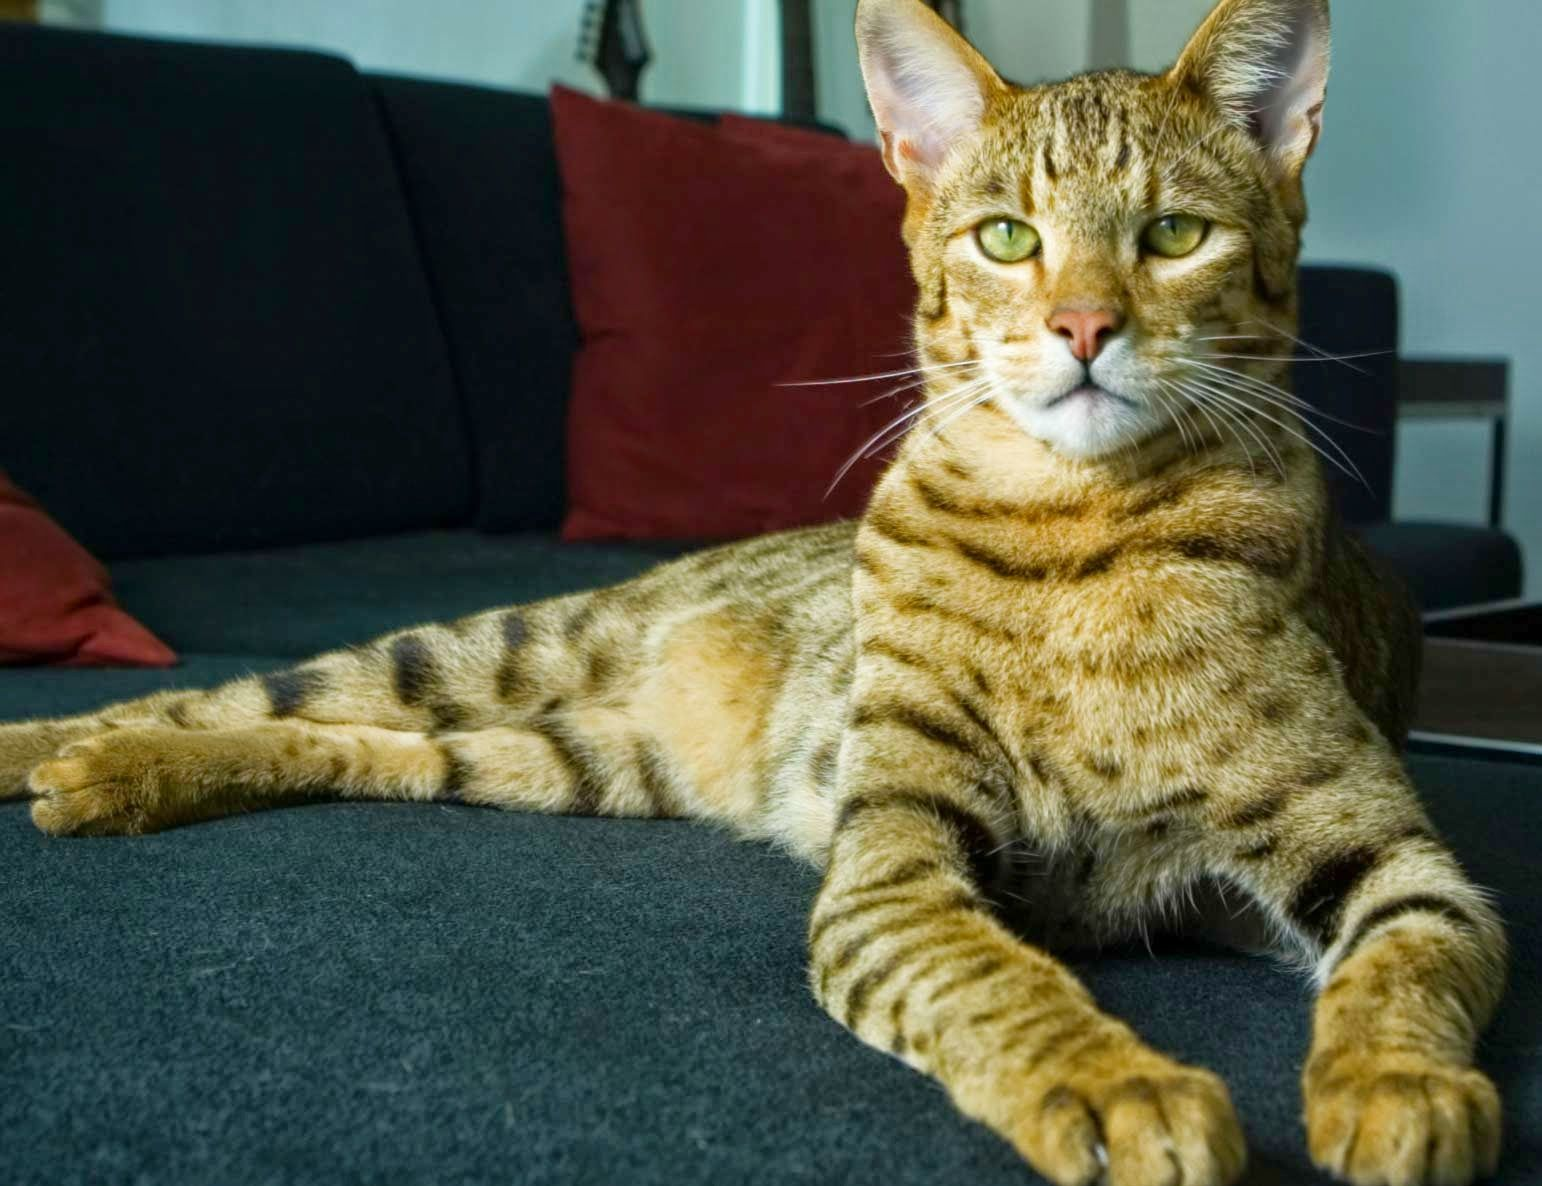 Hypoallergenic cat. Cat Breeds - photos, description 34